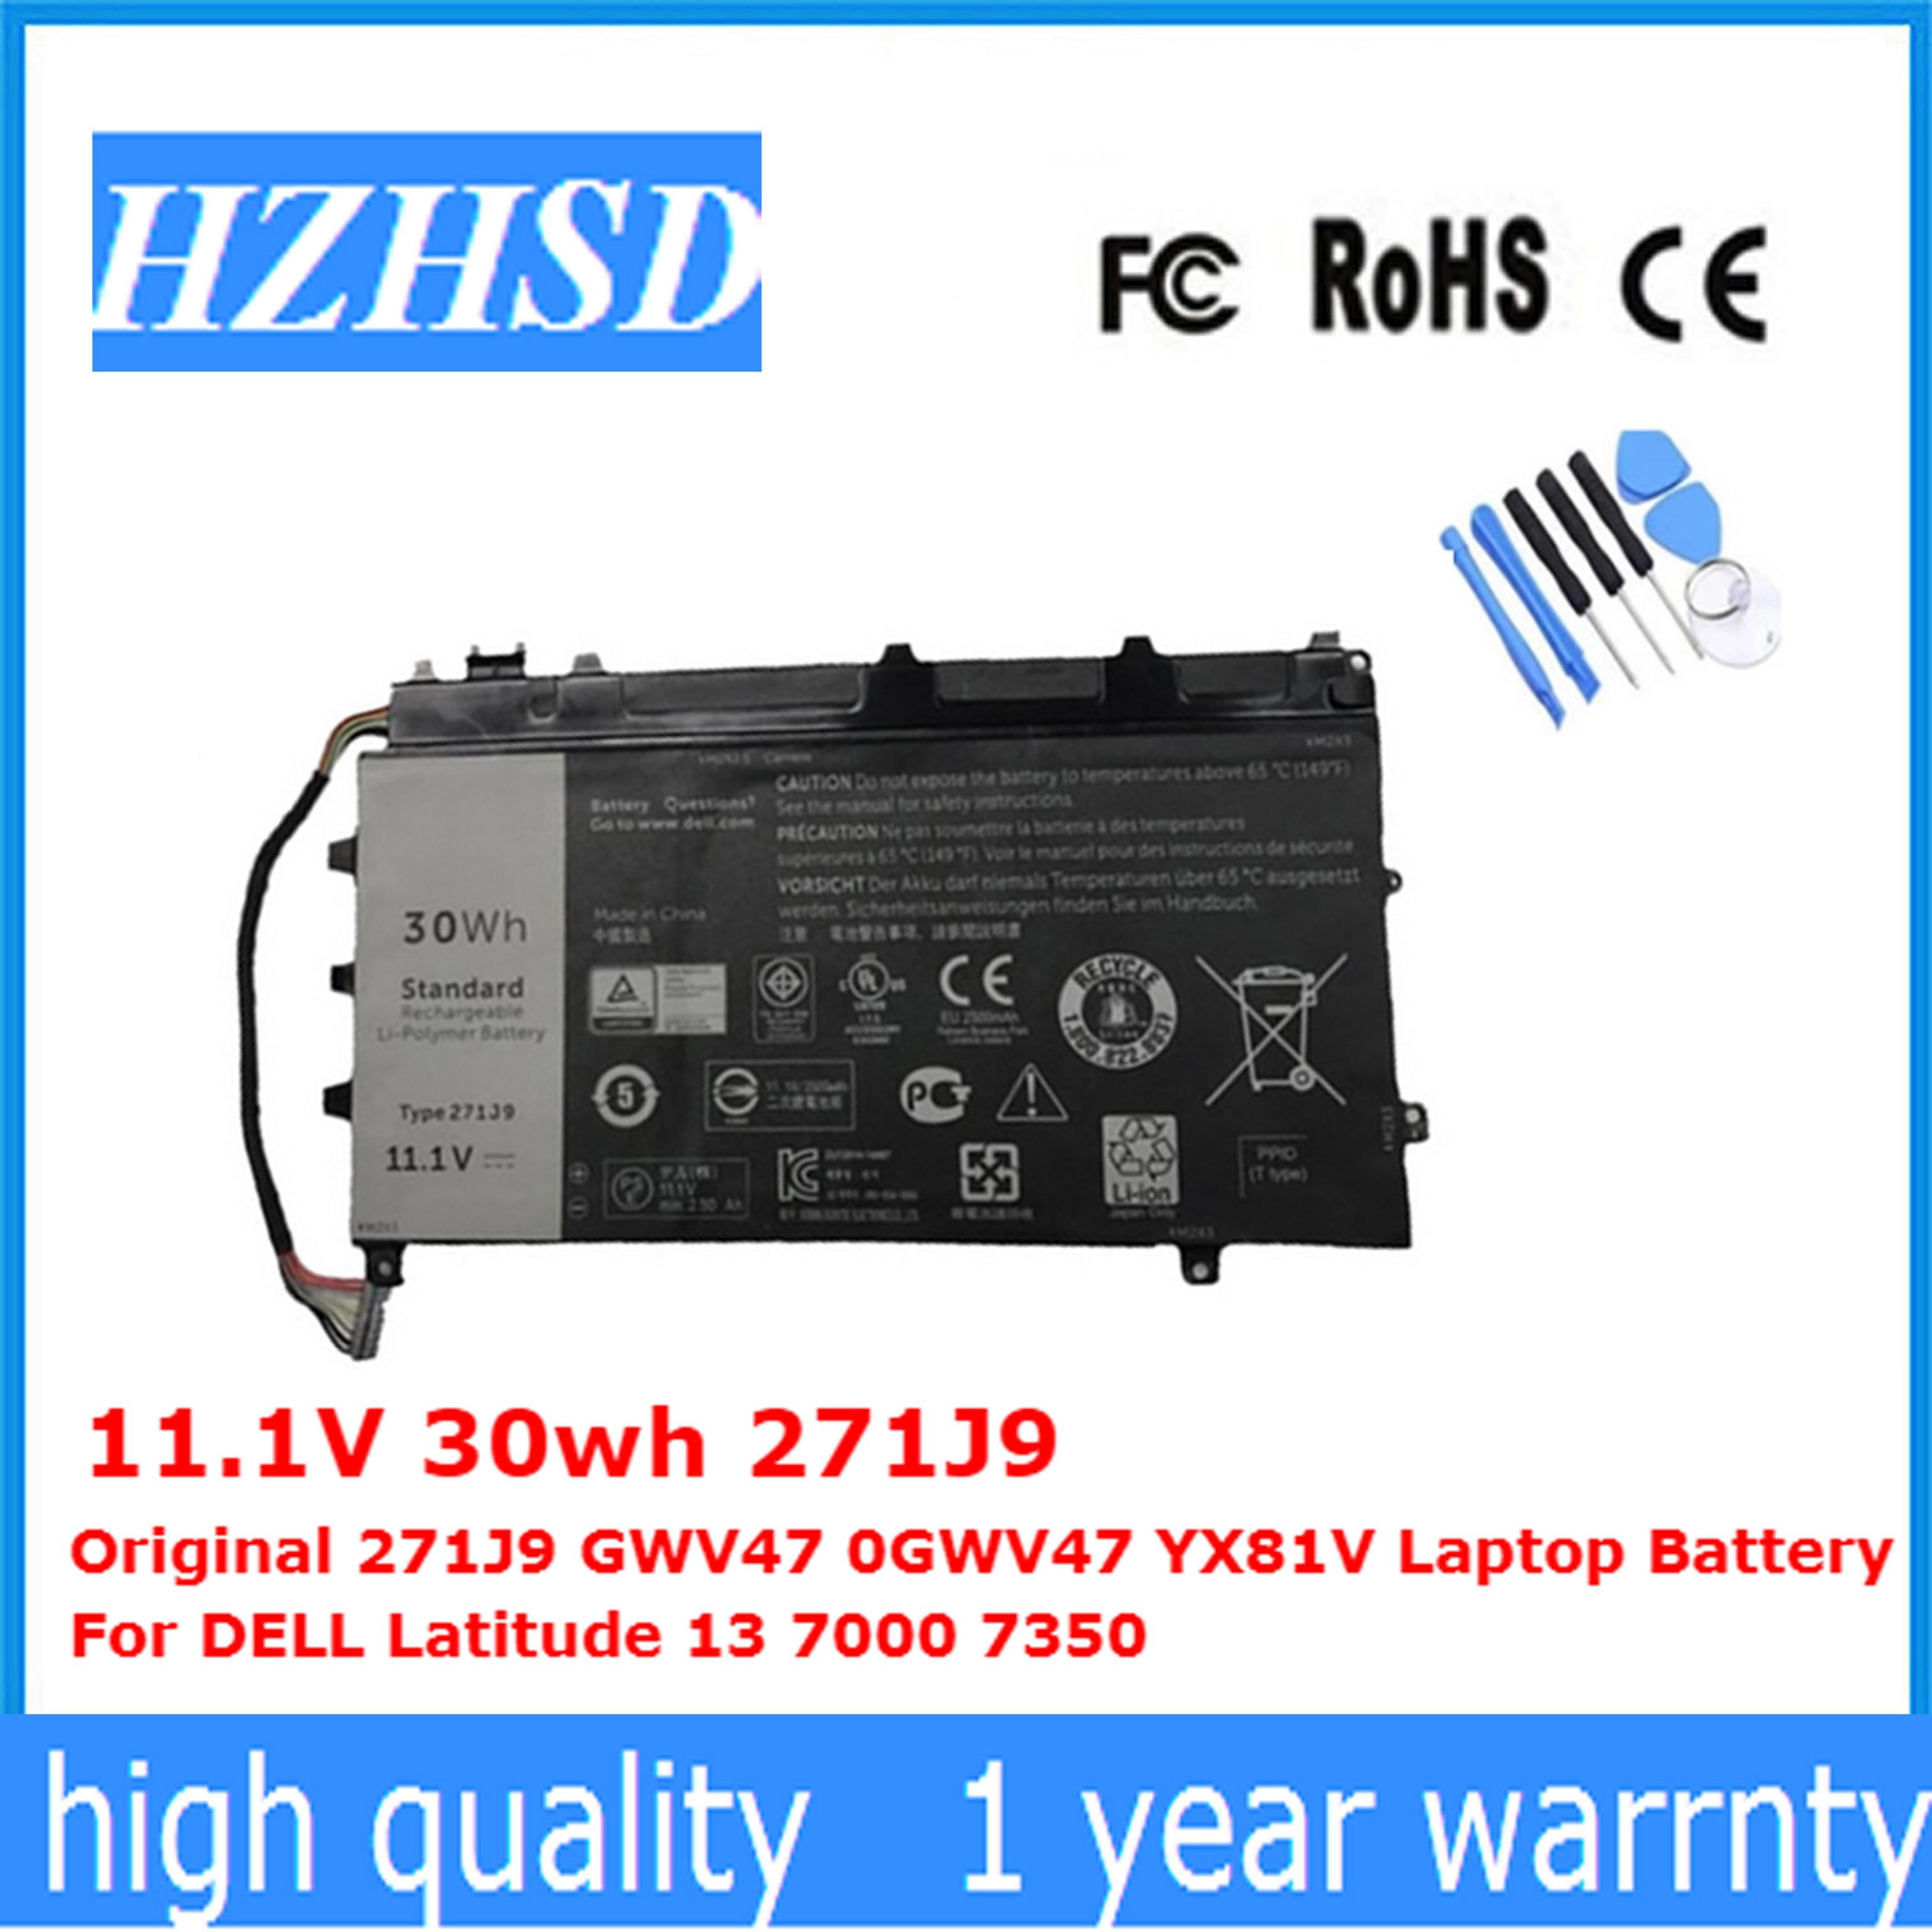 11.1V 30wh Original 271J9 GWV47 0GWV47 YX81V Laptop Battery For DELL Latitude 13 7000 7350